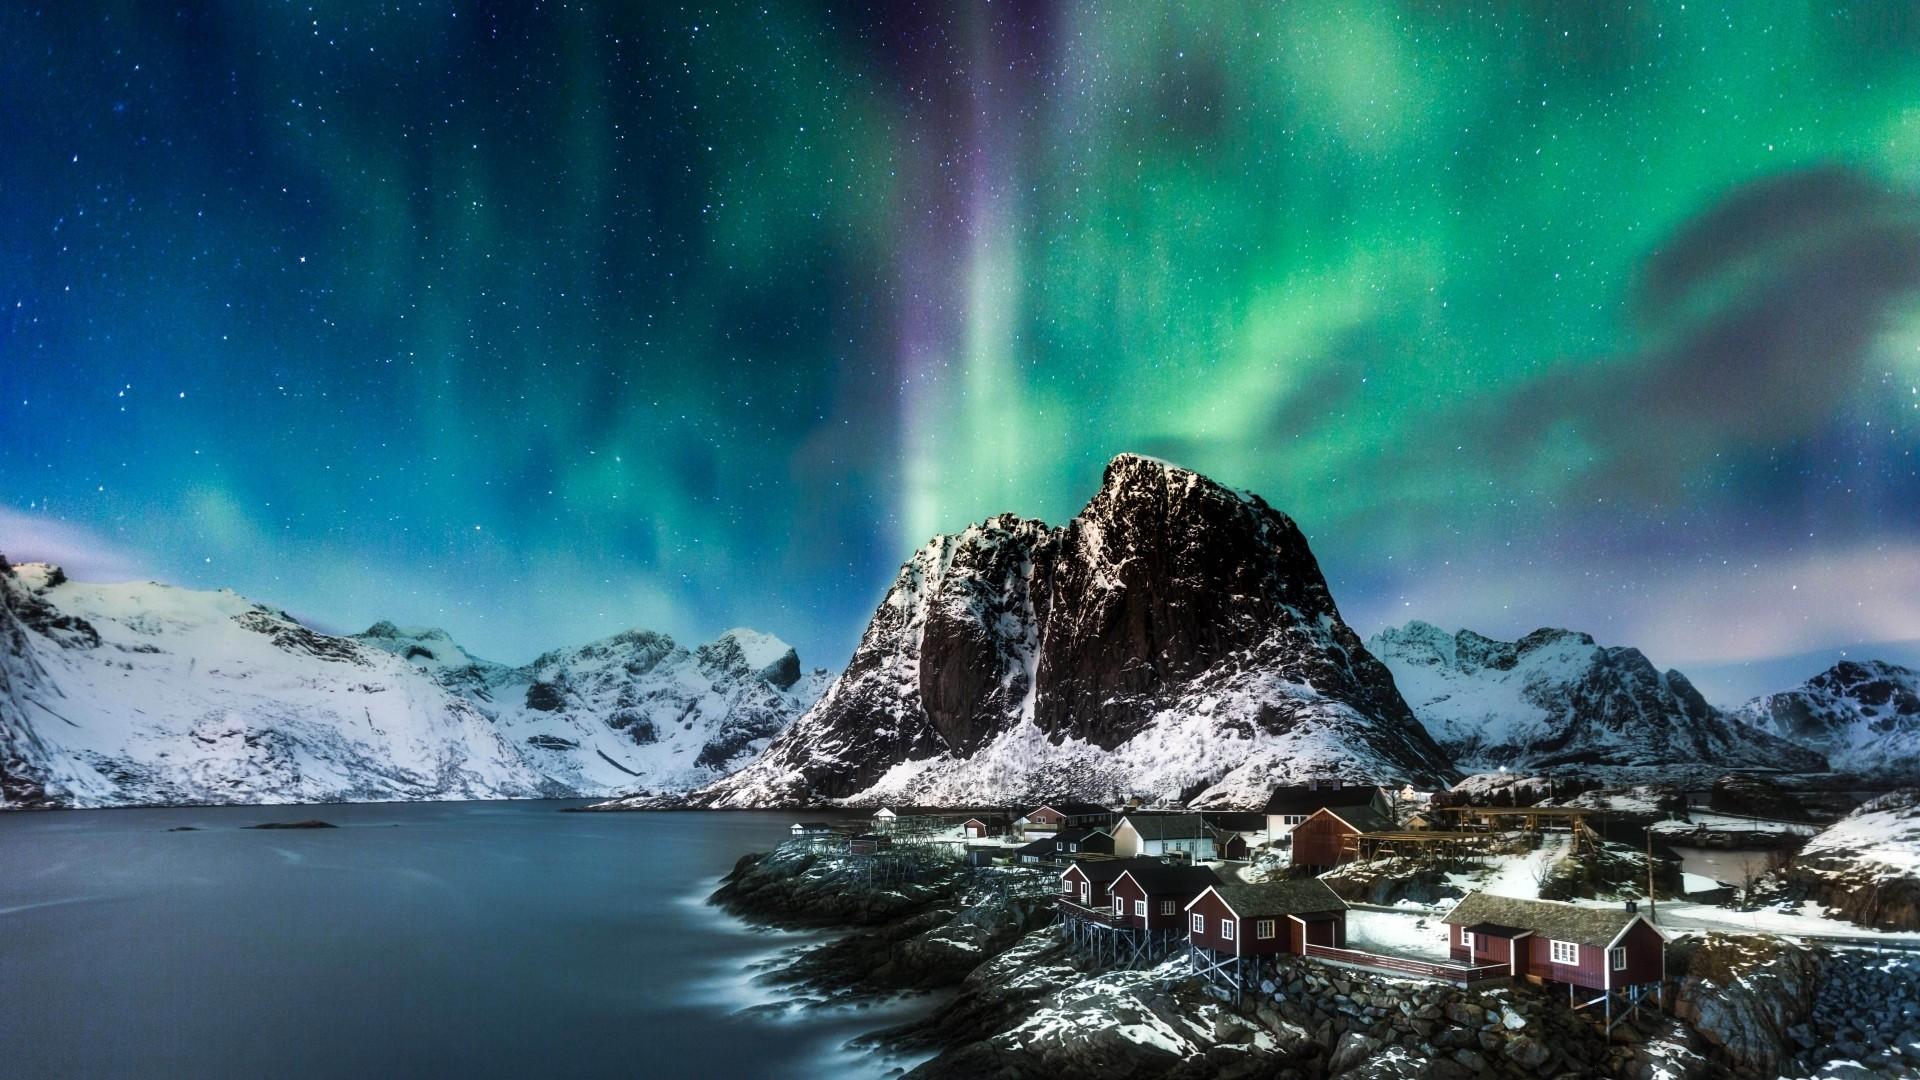 Northern Lights computer wallpaper